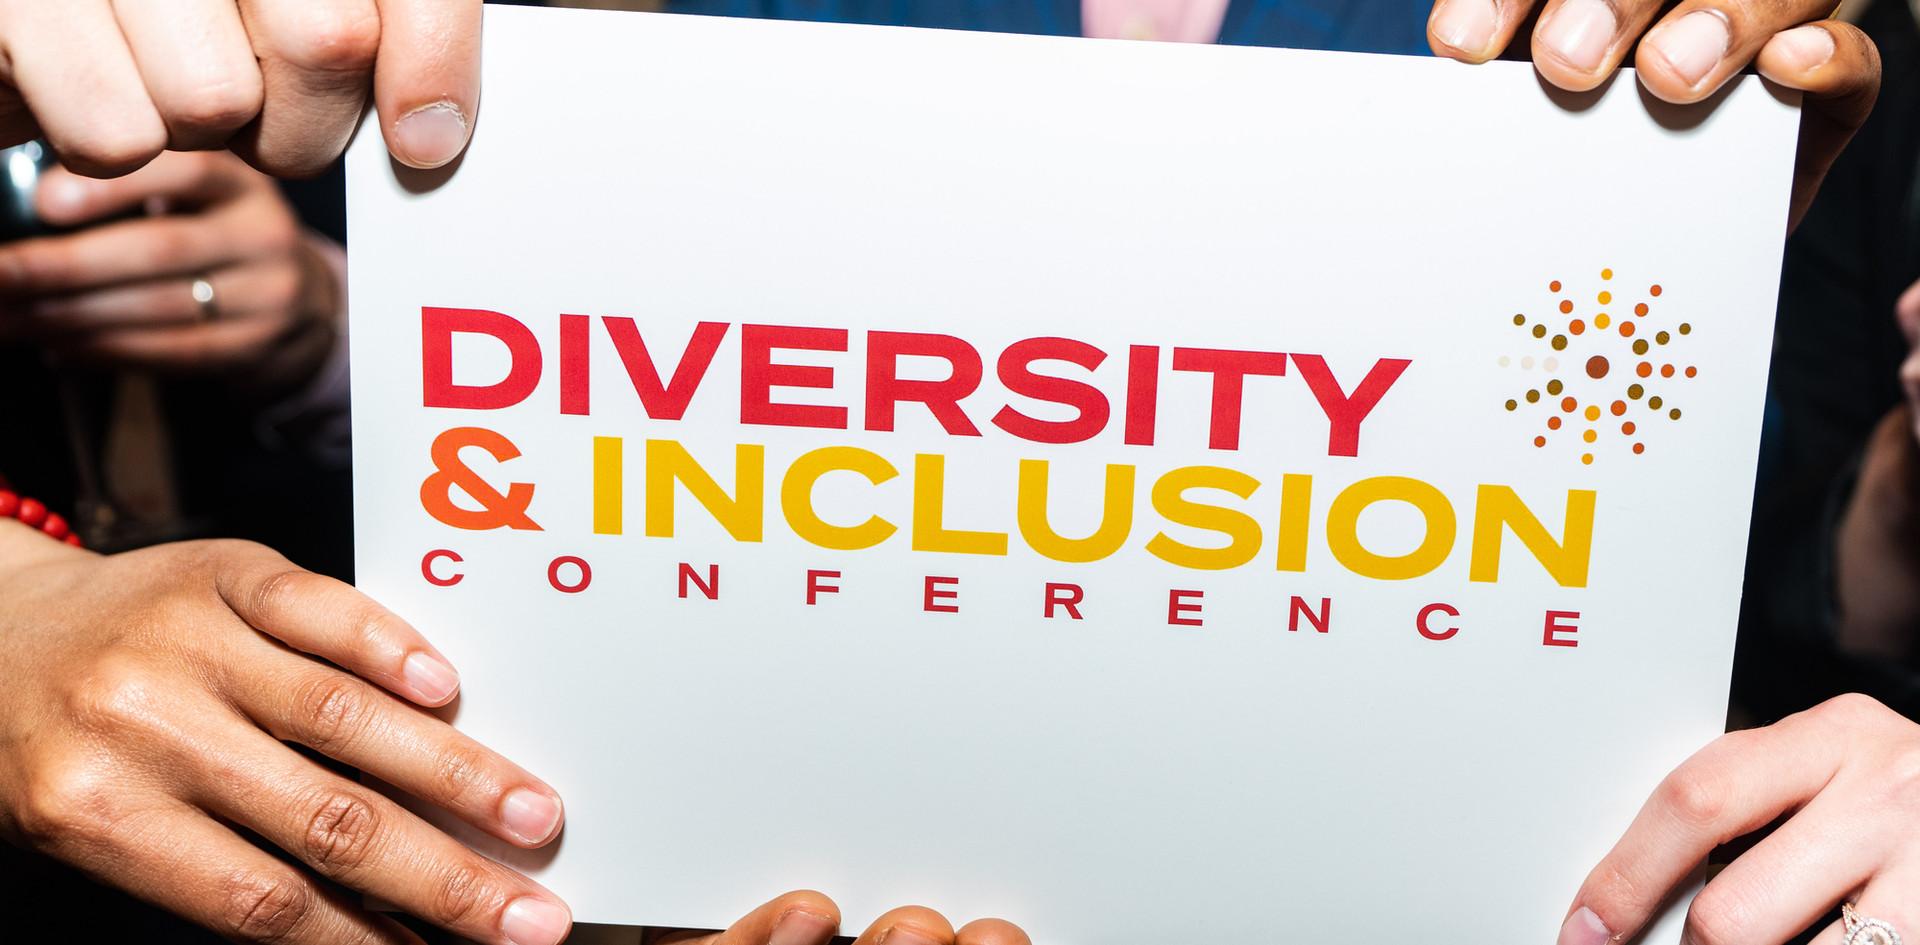 2019 Philadelphia Diversity & Inclusion